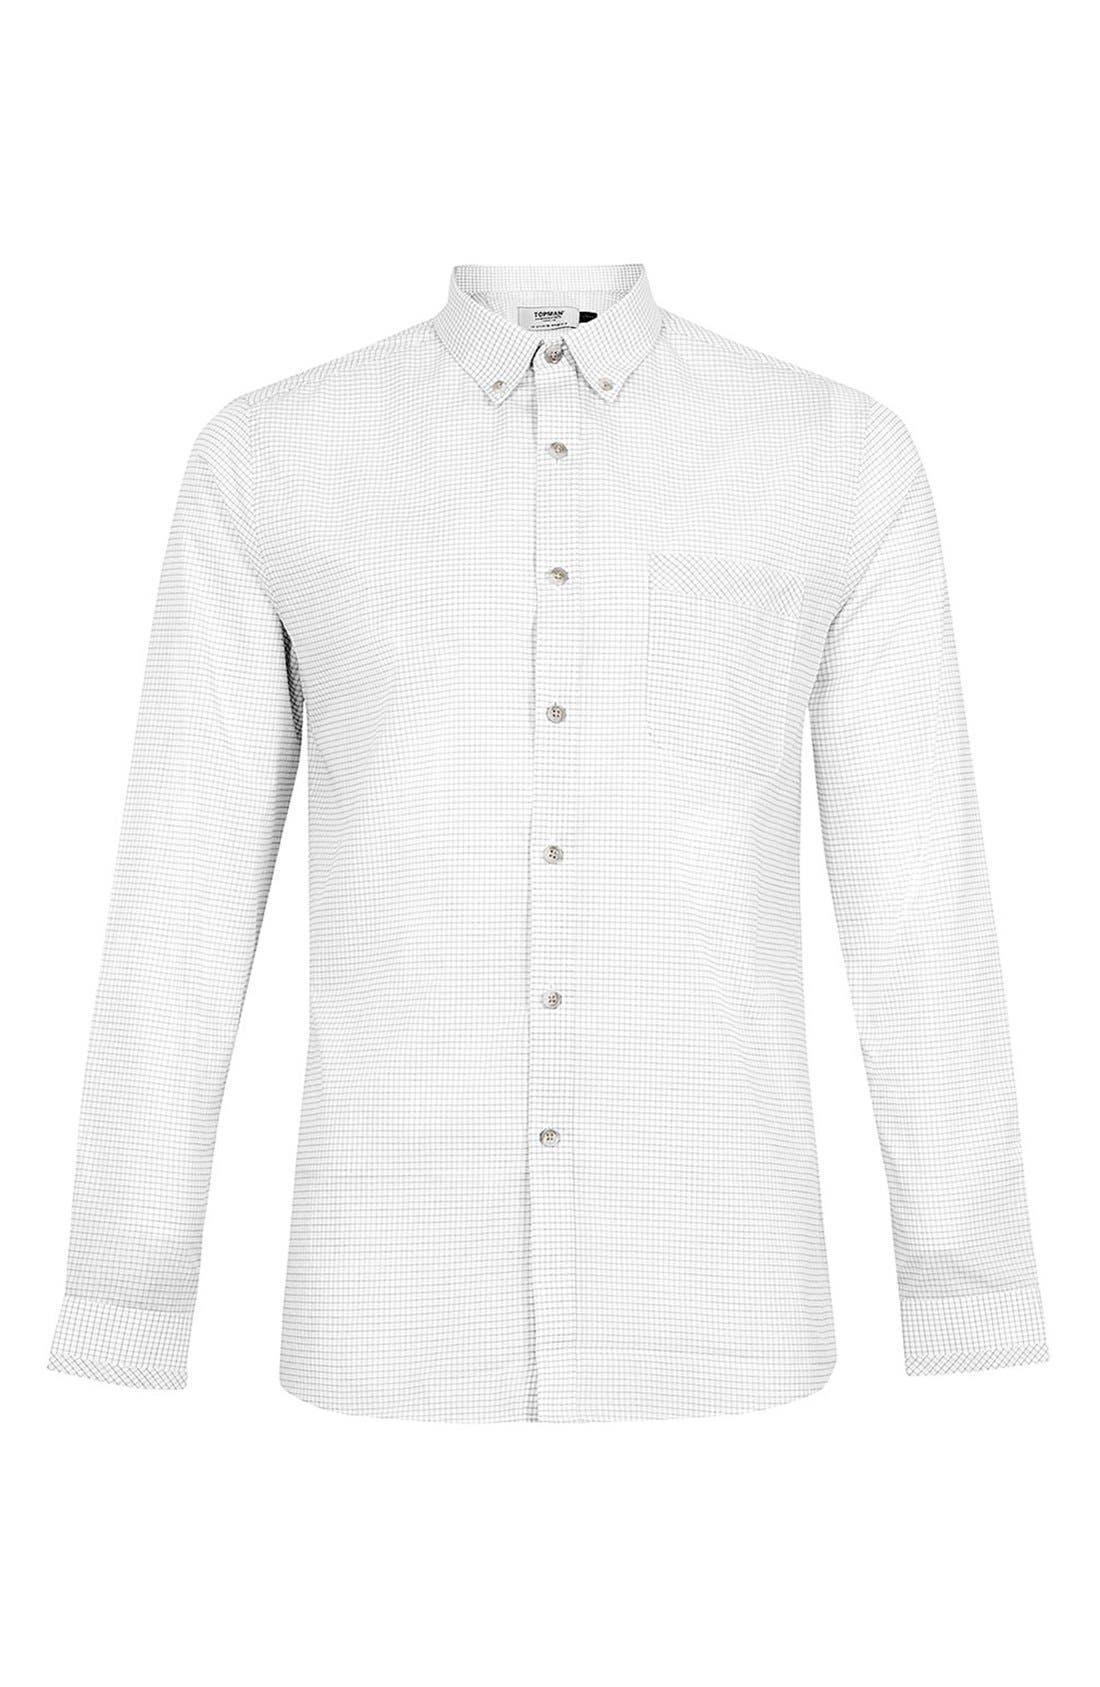 Alternate Image 1 Selected - Topman Check Sport Shirt